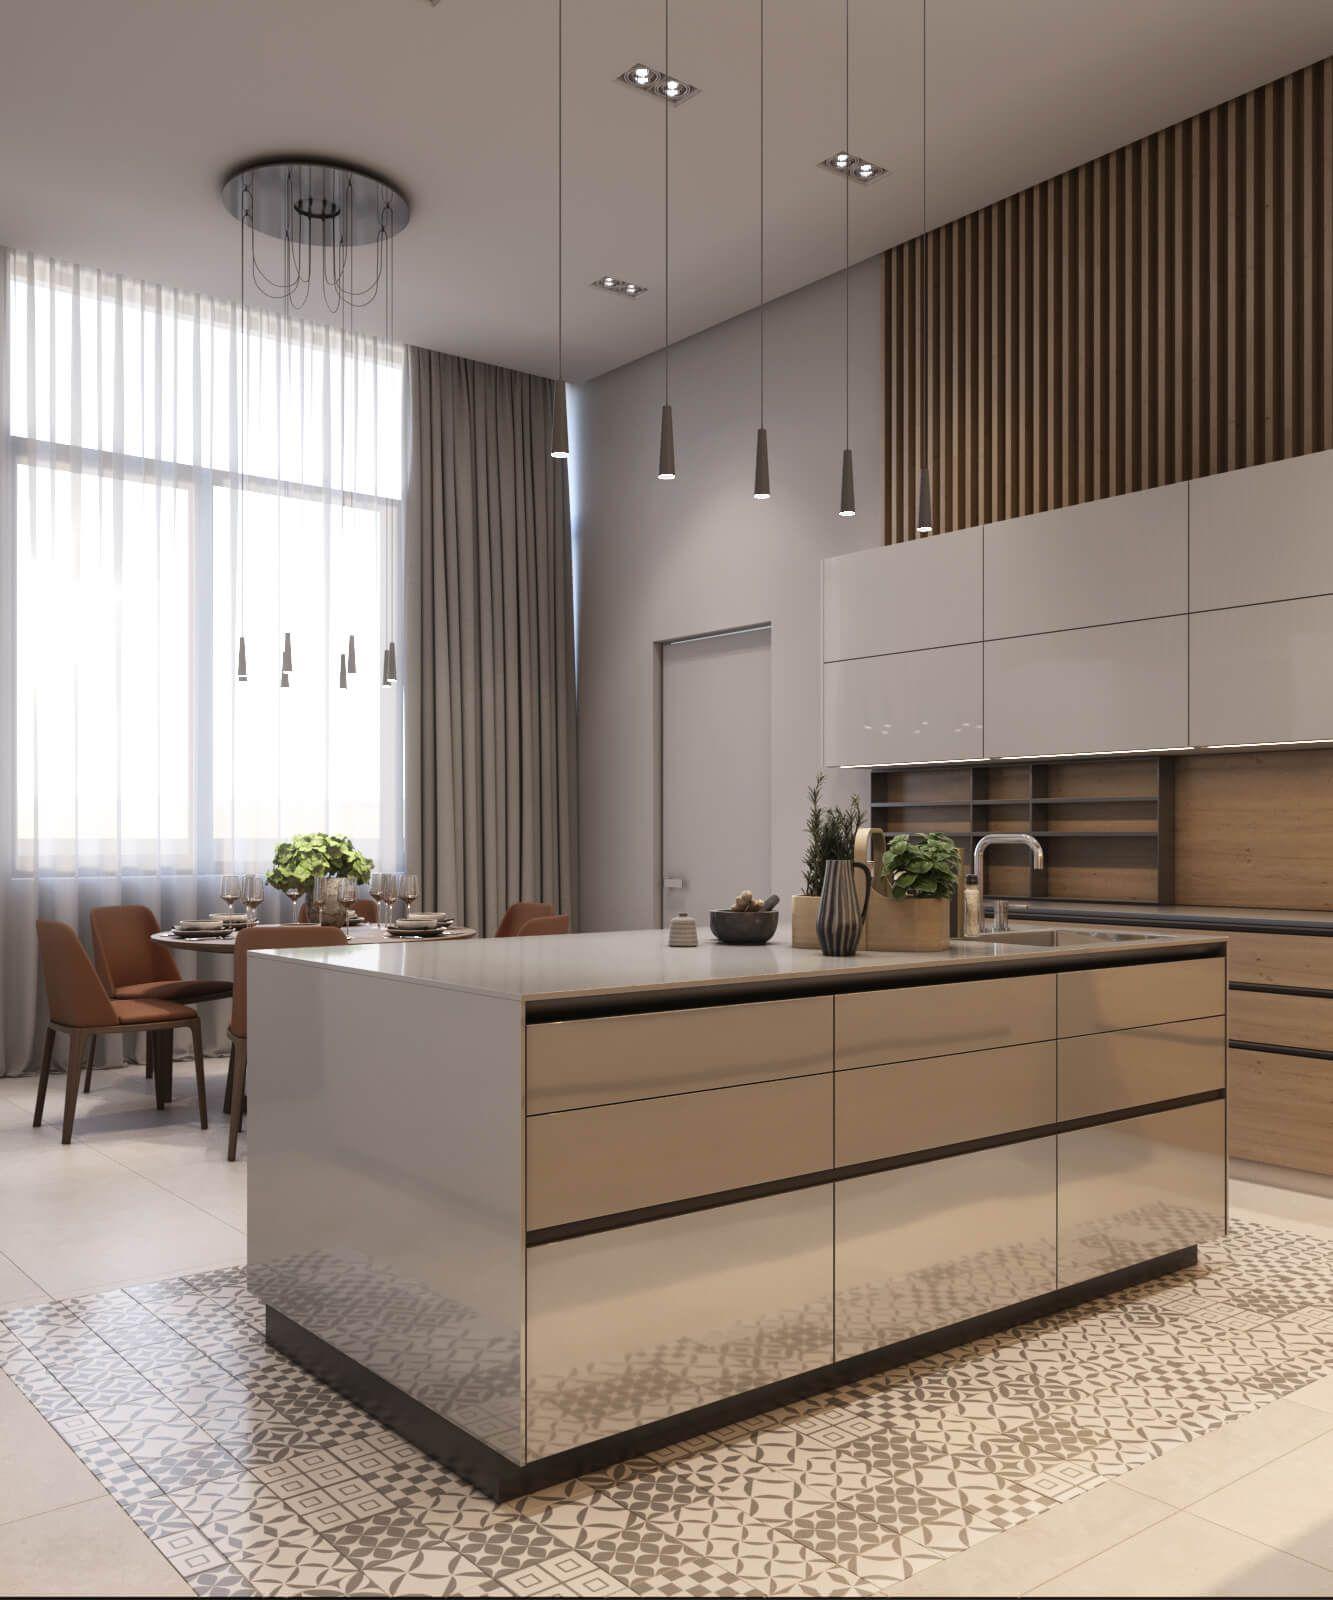 Modern House Bucha Iqosa Pinterest # Muebles Cocina Zelari Nuzzi